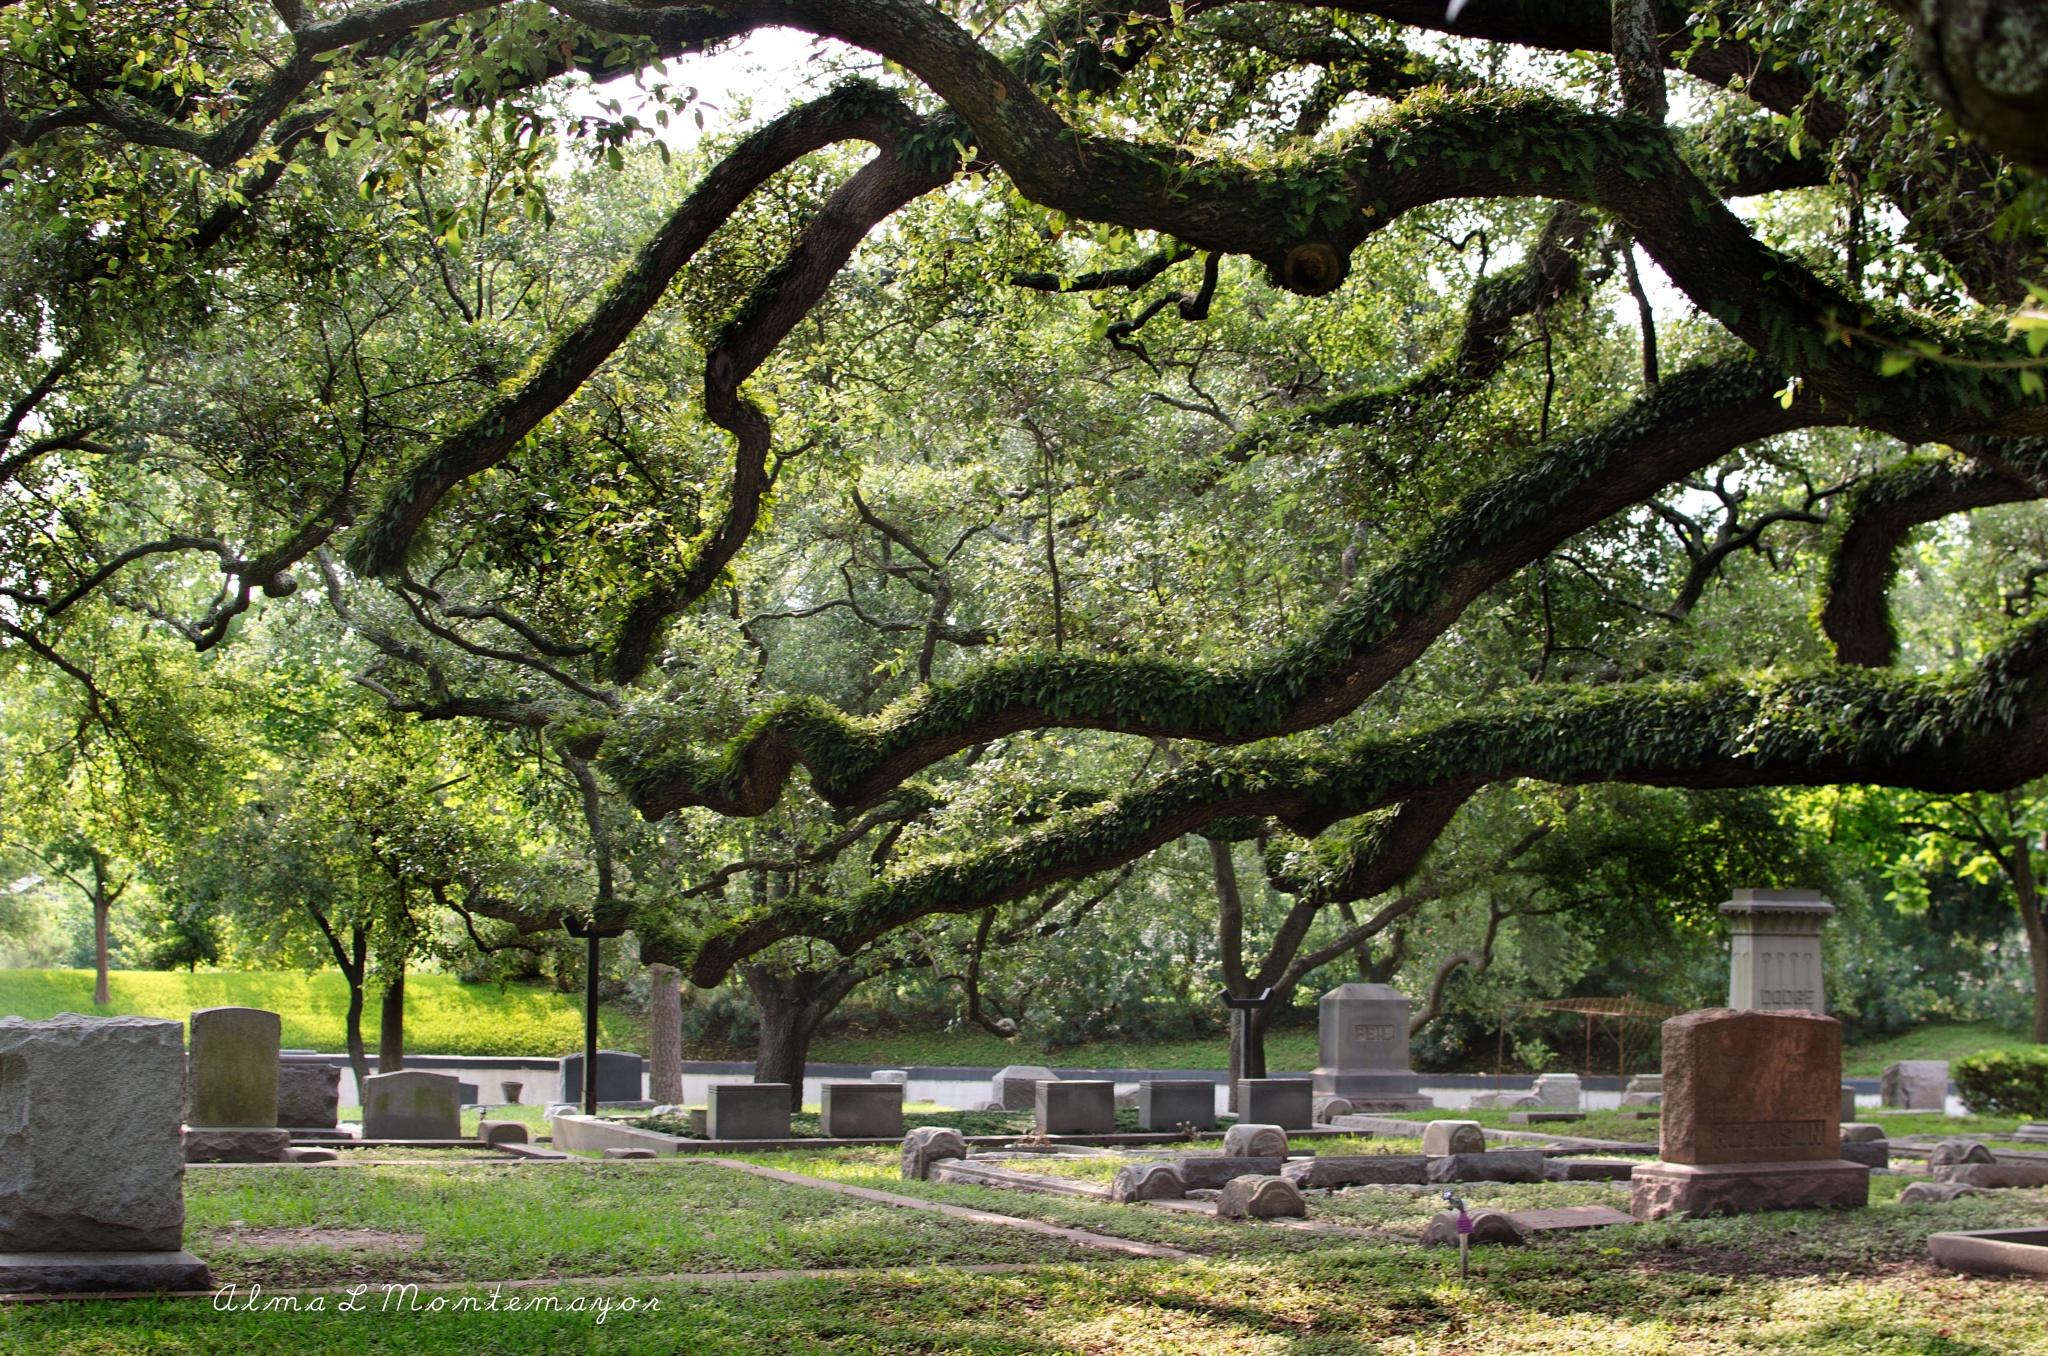 Glenwood Cemetery by Alma